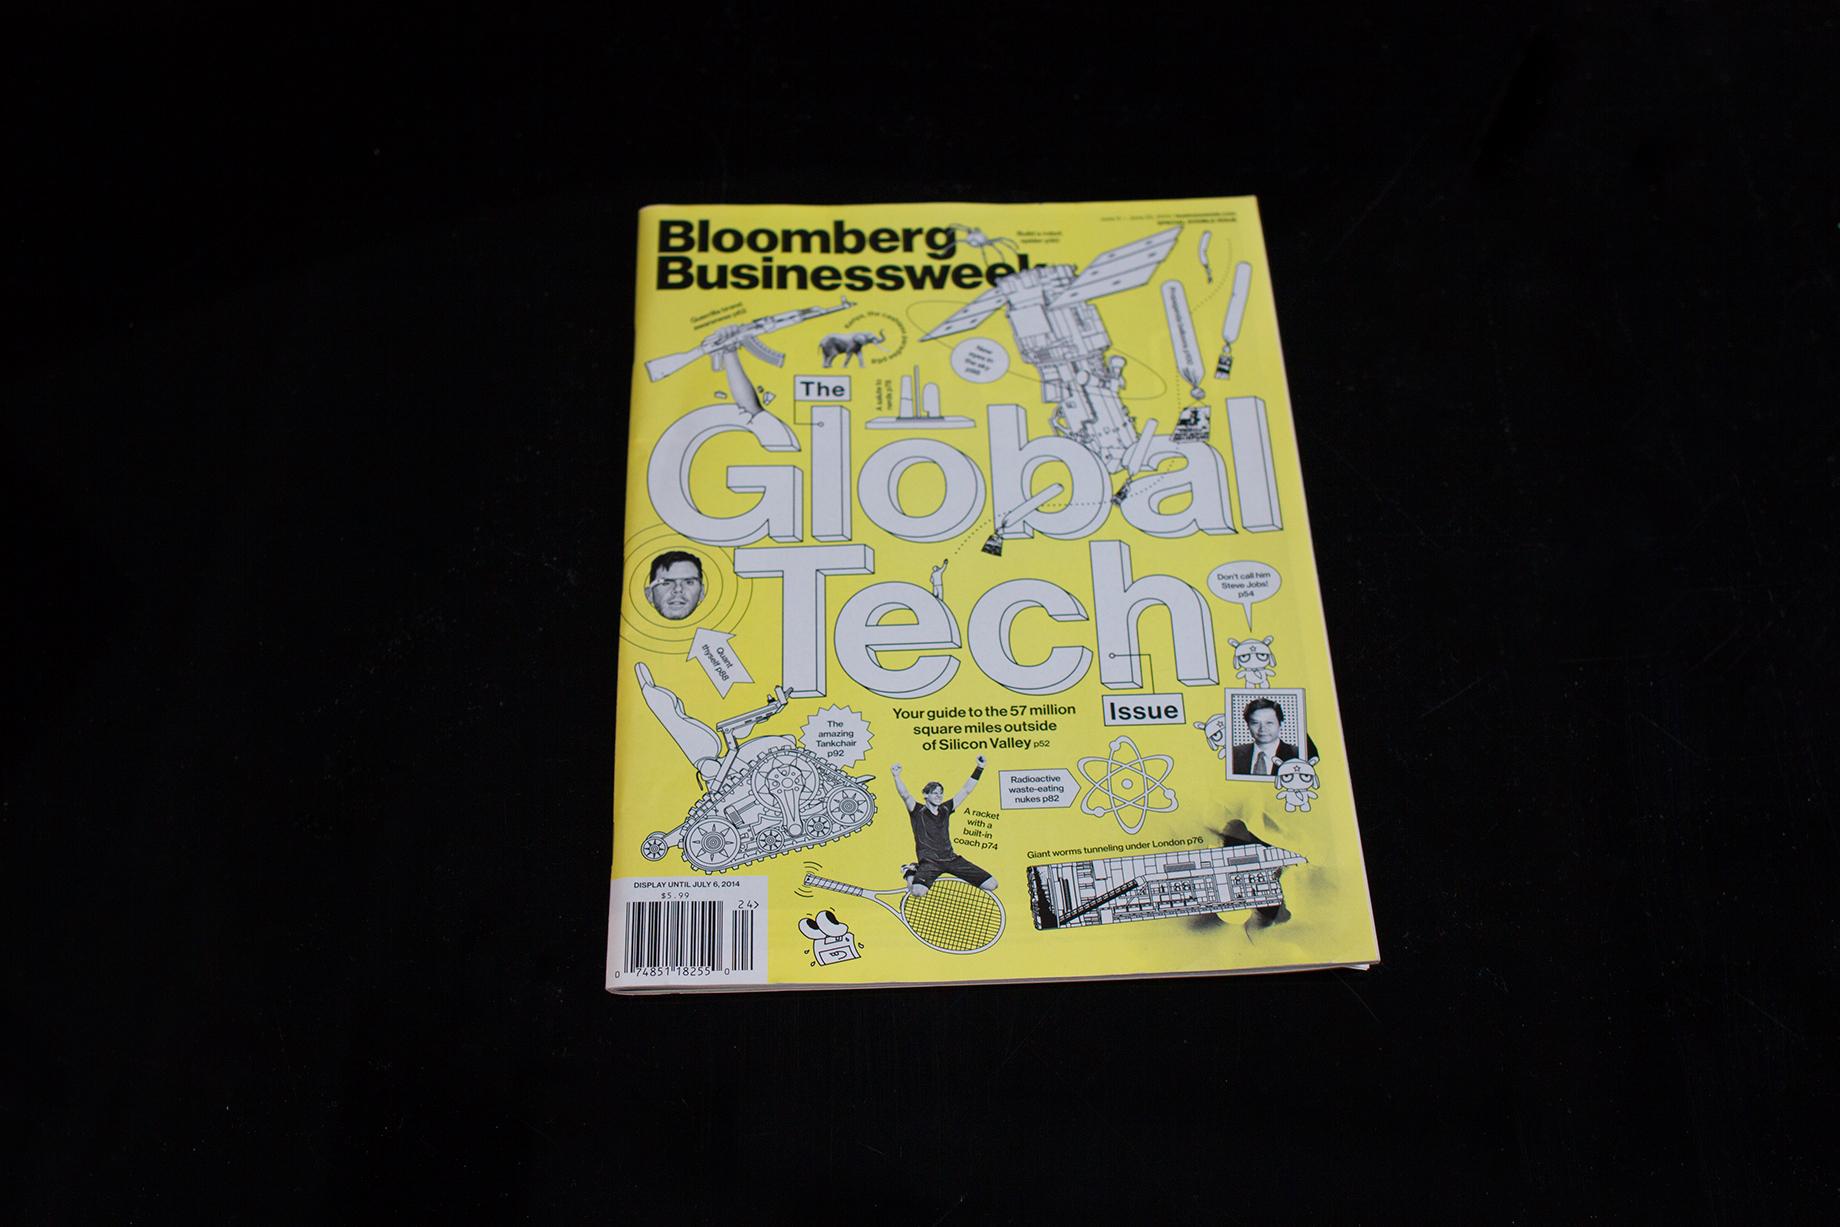 Bloomberg Business News